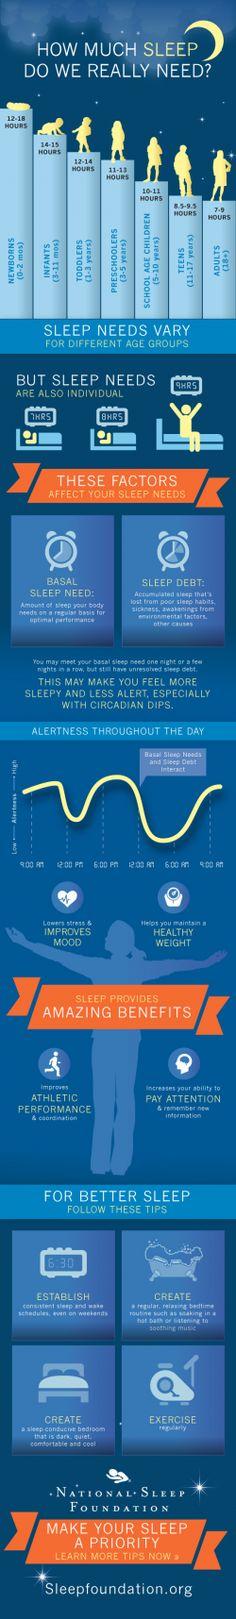 How Much Sleep Do We Really Need? - Excessive Sleepiness